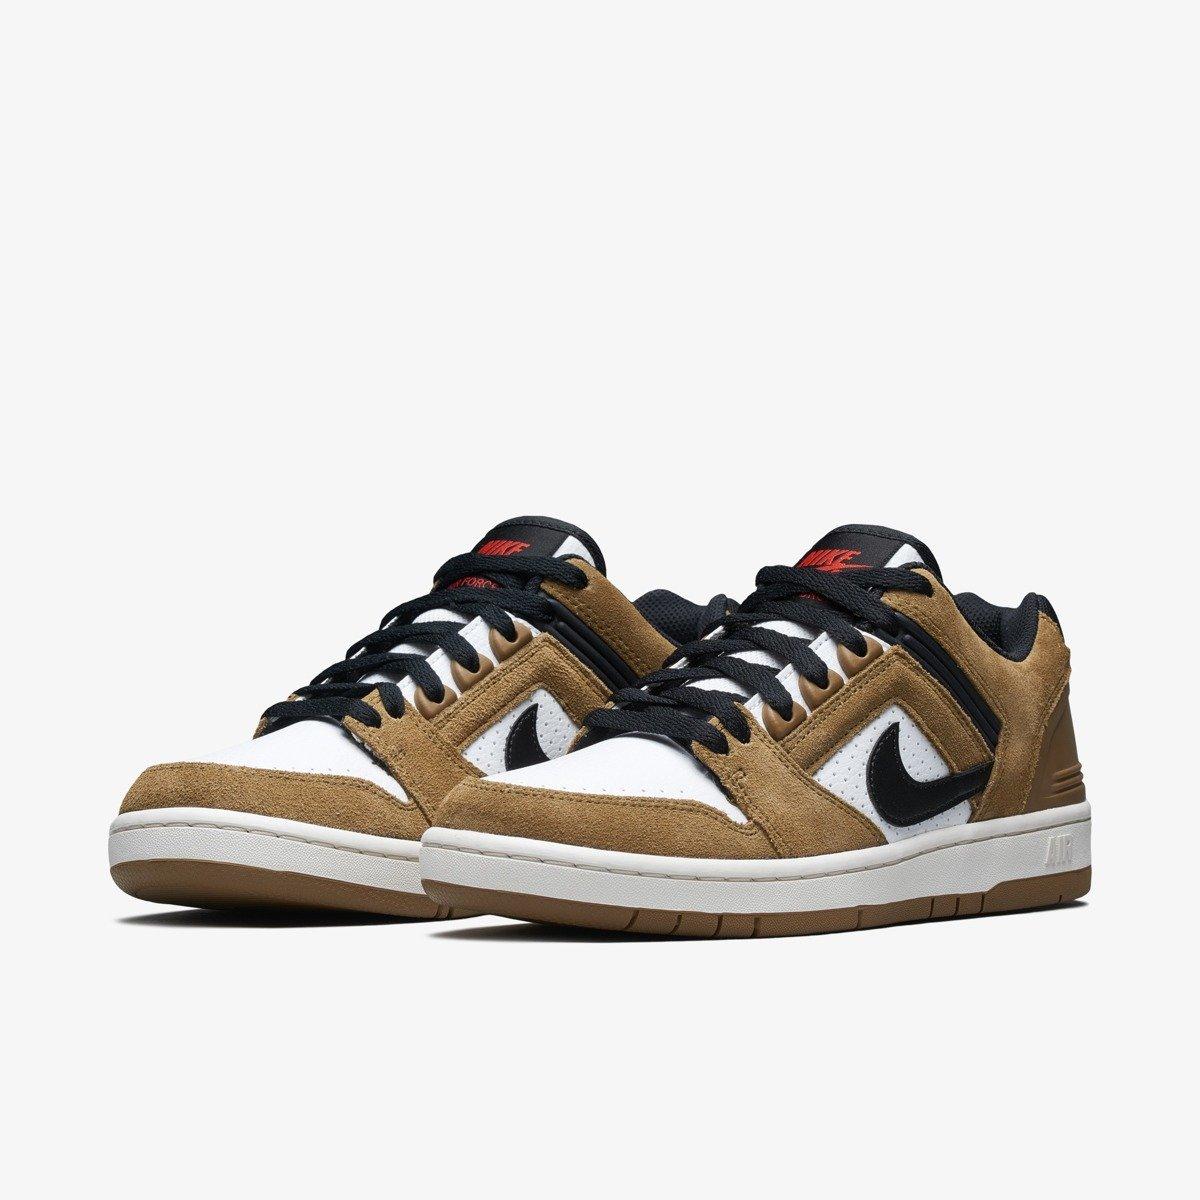 shoes Nike SB Air Force II Low lichen brownblack white phantom